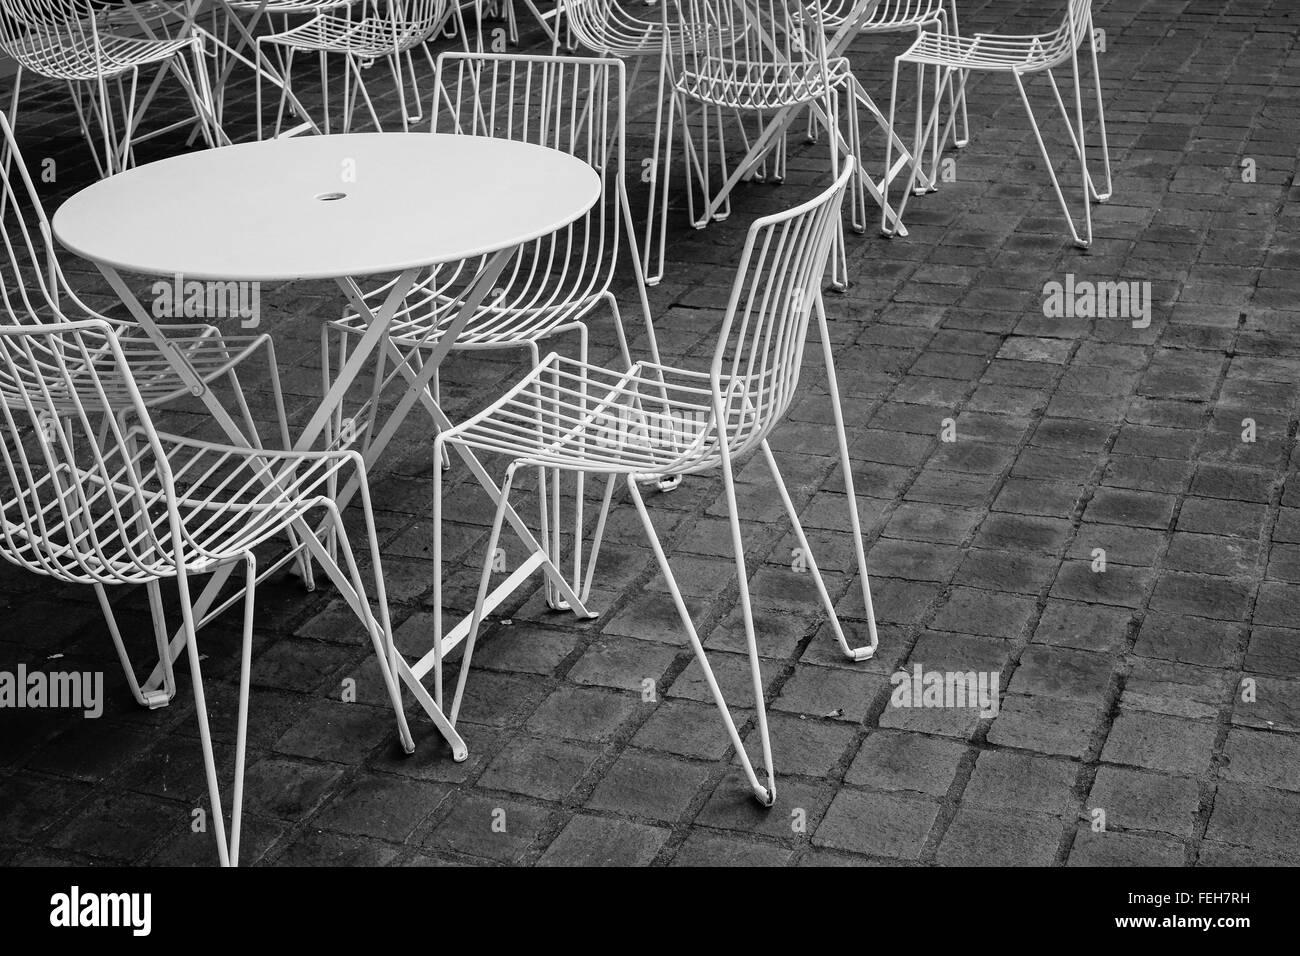 Chaises trottoirs Banque D'Images